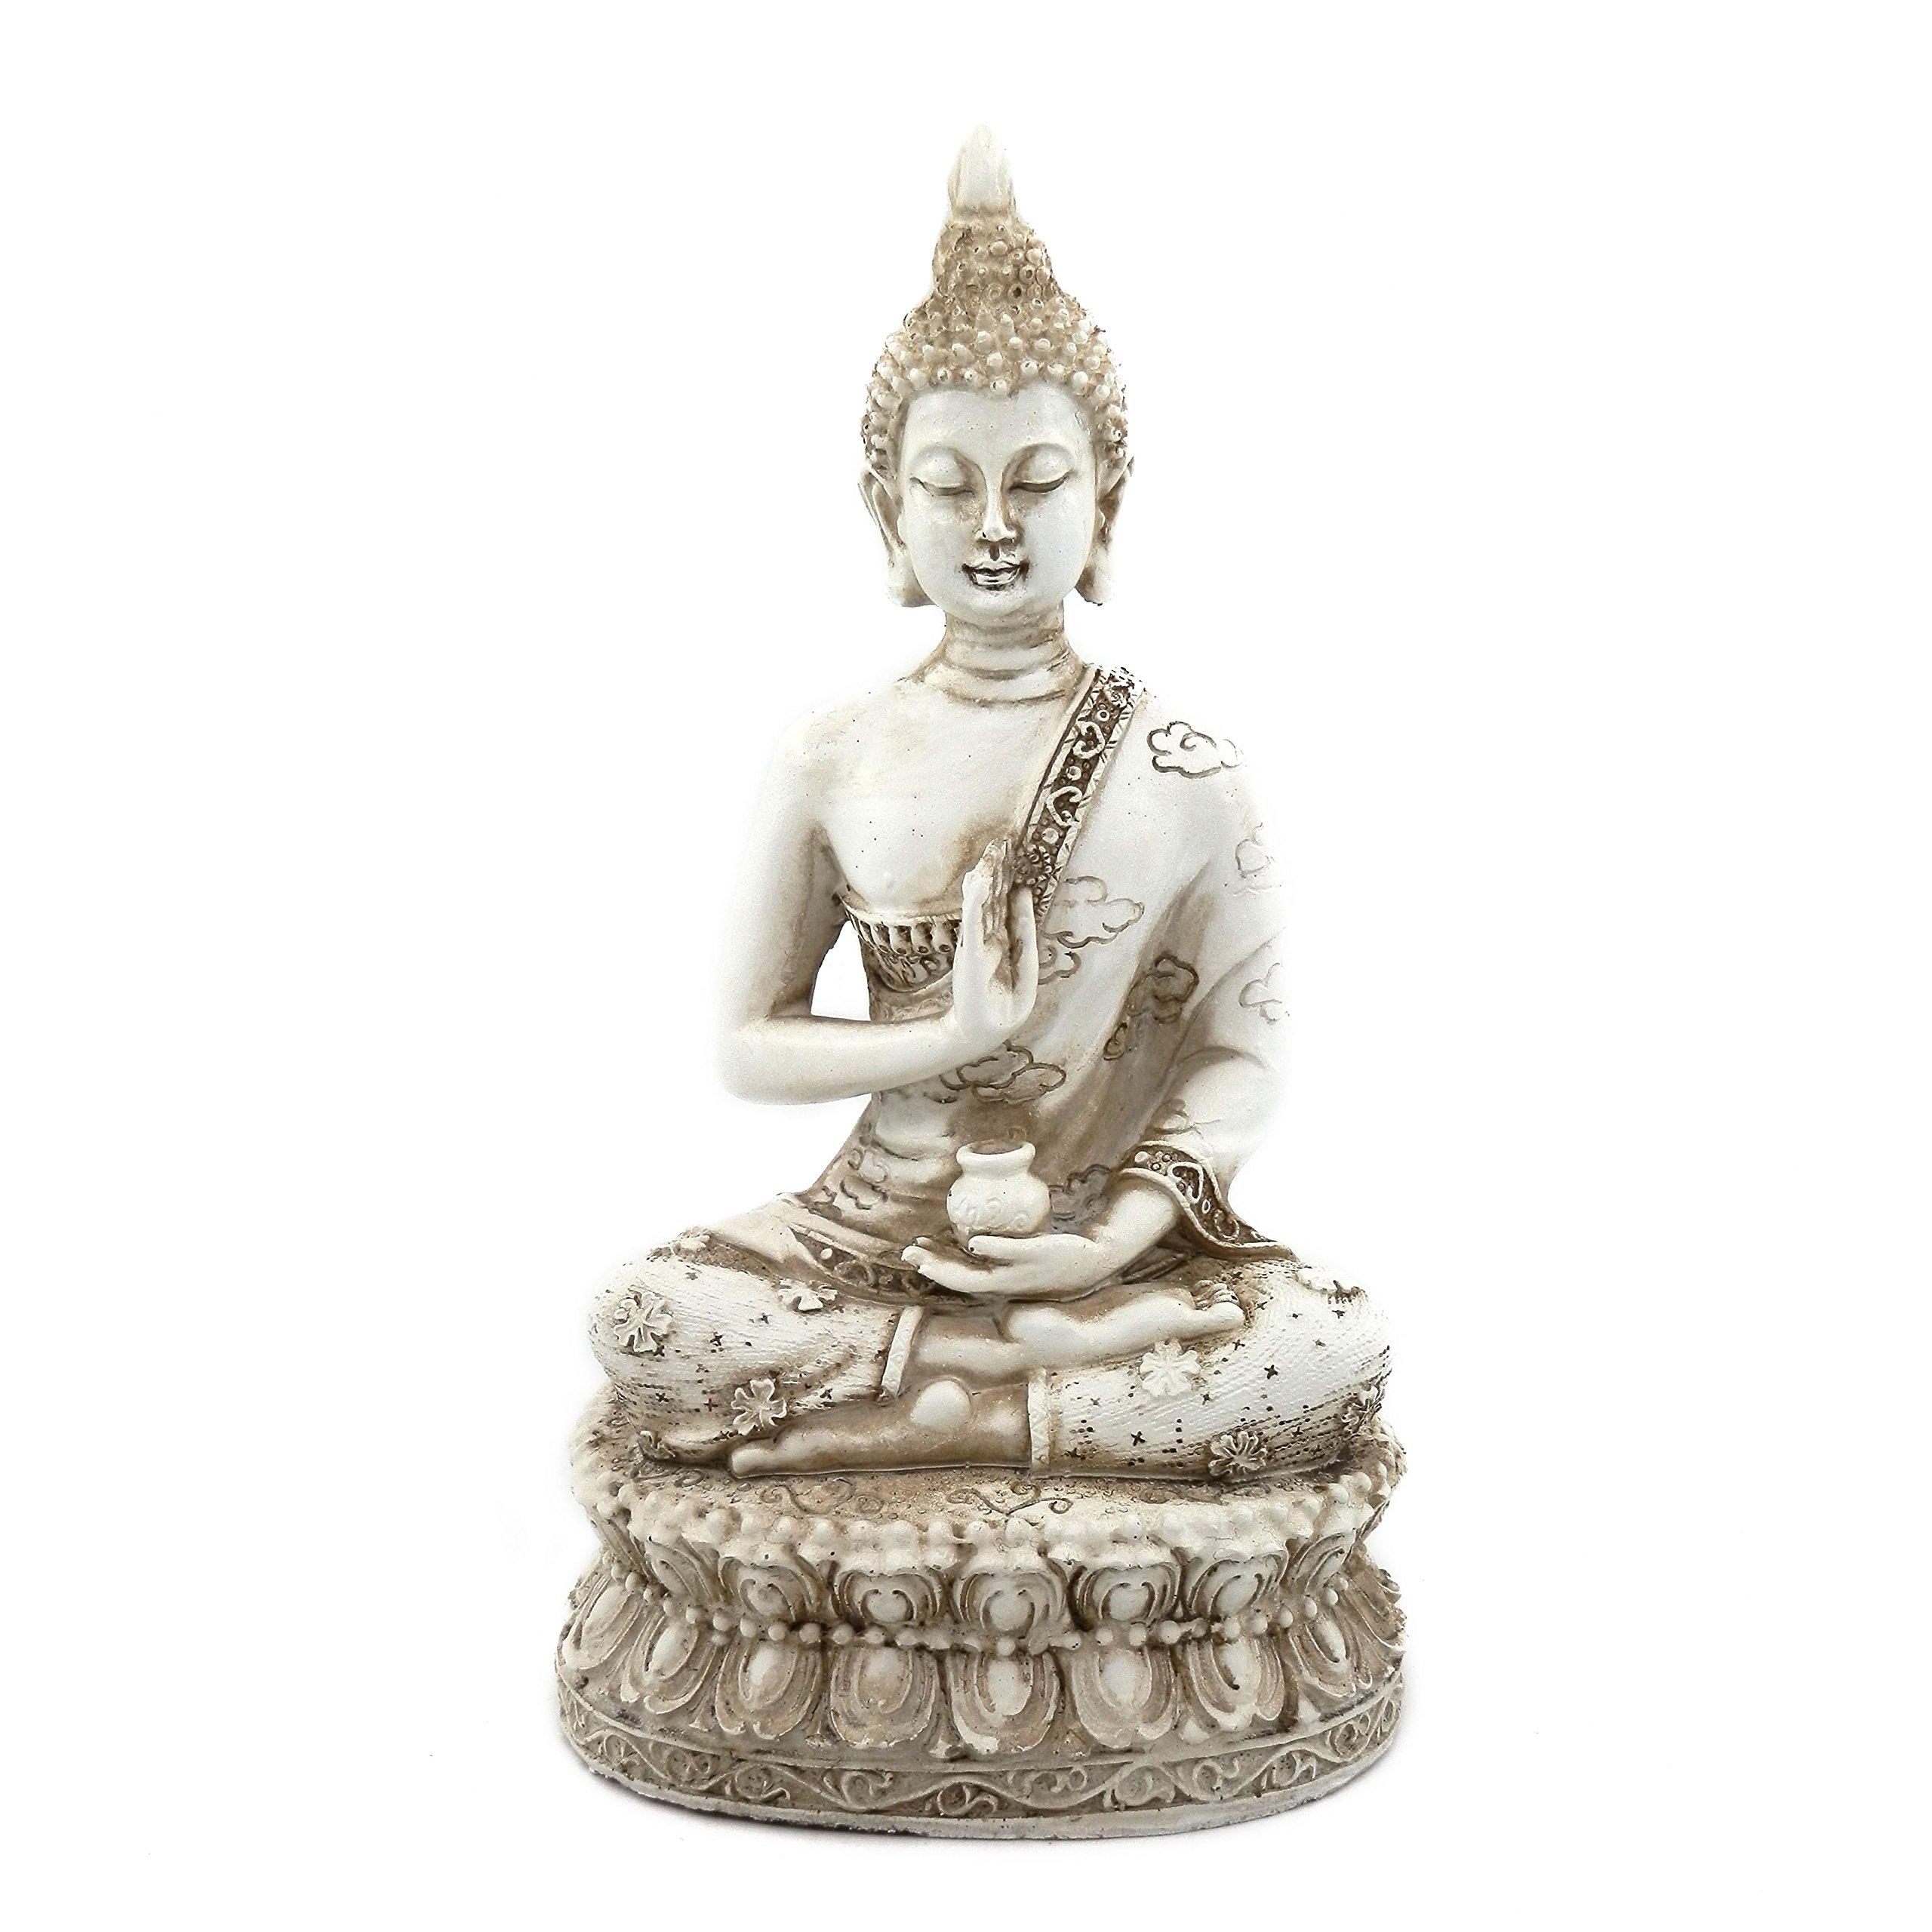 ornerx Thai Sitting Buddha Statue for Home Decor Ivory 6.7'' by ornerx